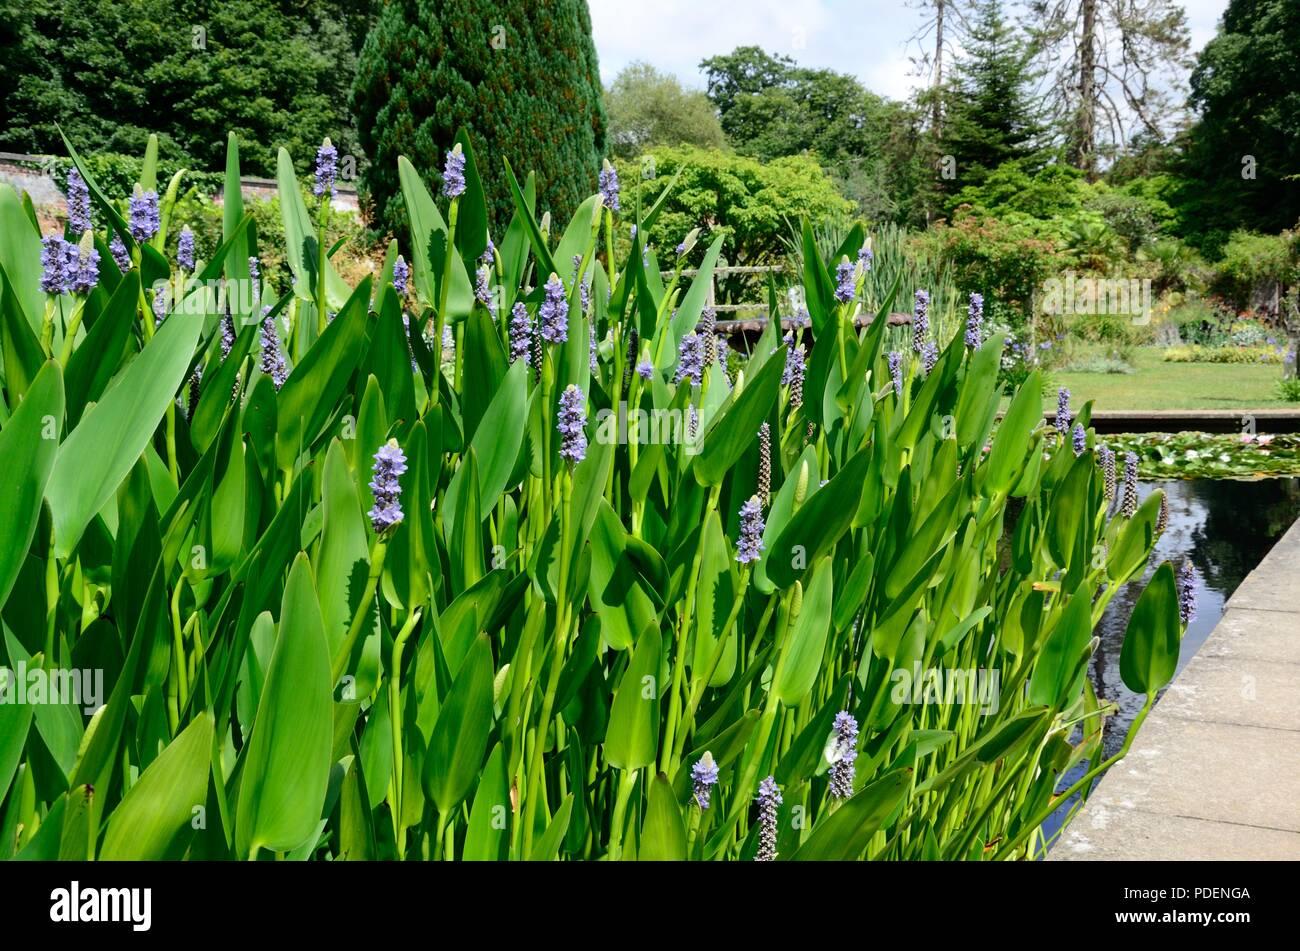 Blue Flower Spikes Of Pontederia Cordata Or Pickerel Weed Growing In A  Garden Pond